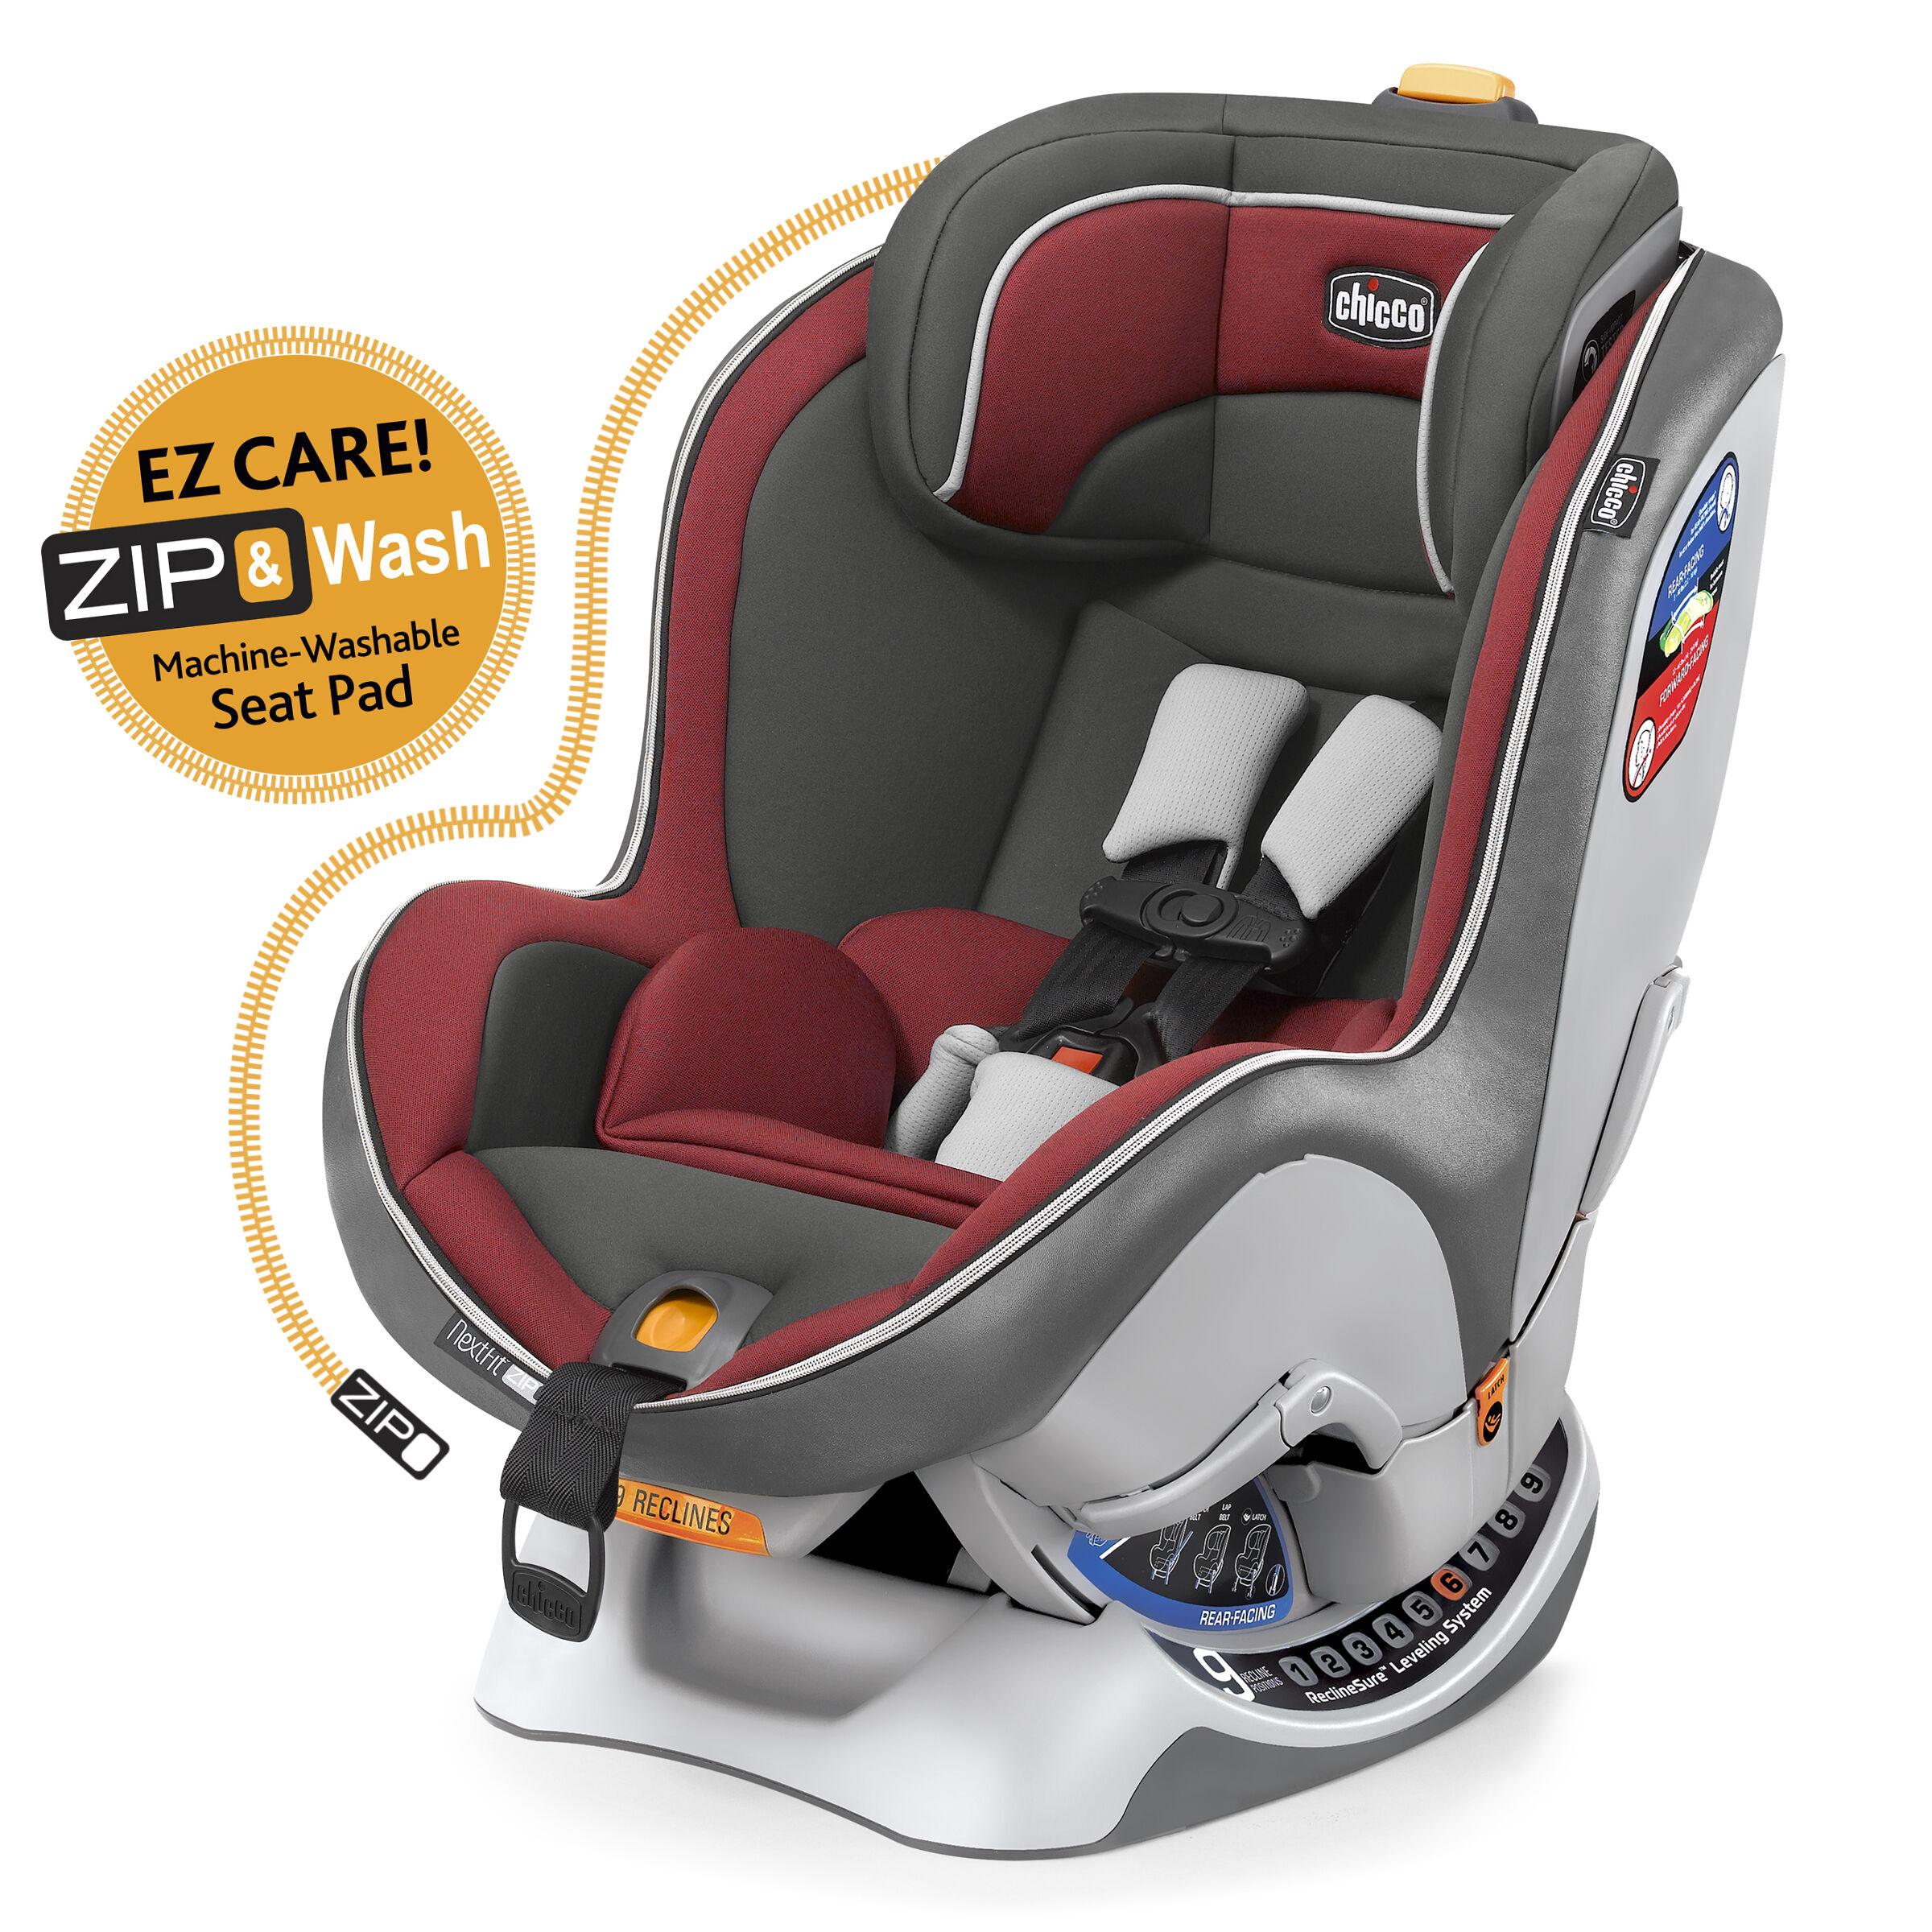 NextFit Zip Convertible Car Seat - Rubino in  sc 1 st  Chicco & Chicco NextFit Zip Convertible Car Seat - Rubino islam-shia.org